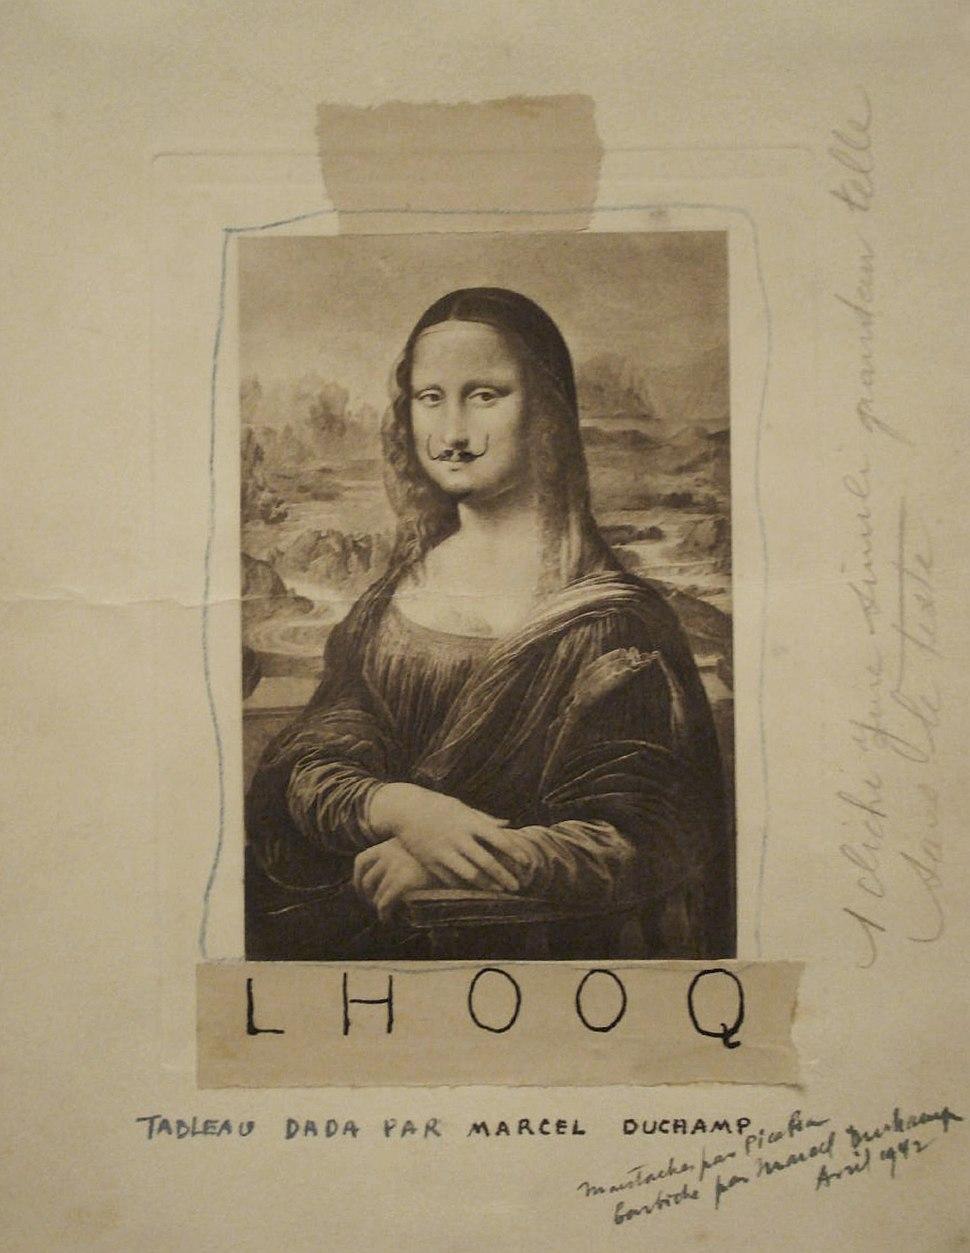 Marcel Duchamp, 1919, L.H.O.O.Q